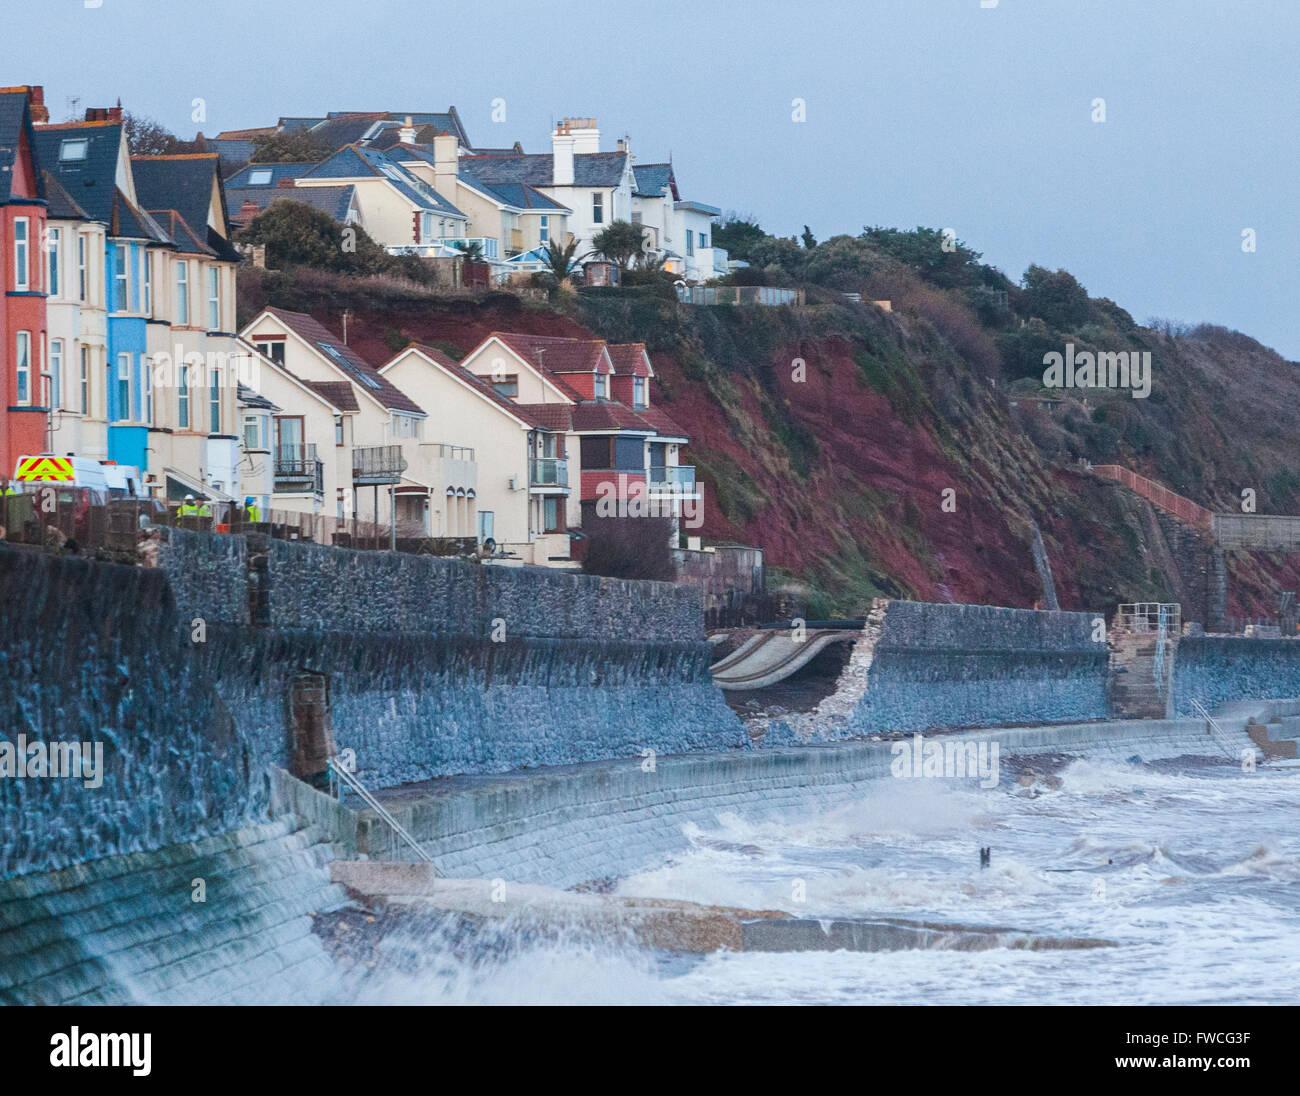 05/02/13  Railway line damage due to heavy seas and storms at Dawlish, Devon, England. - Stock Image